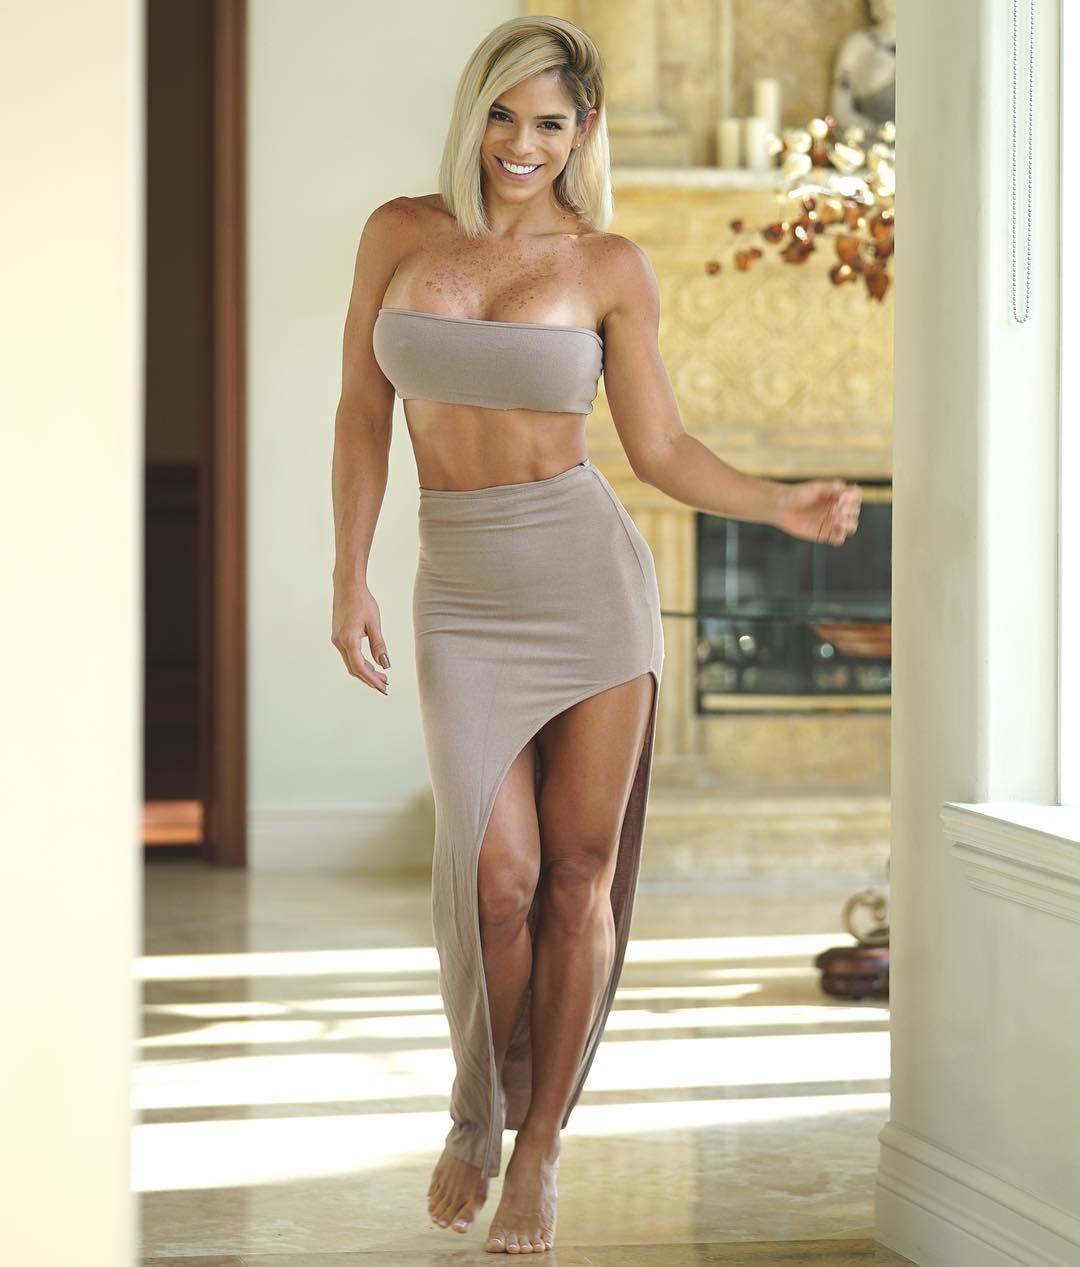 The Hottest Michelle Lewin Photos - 12thBlog